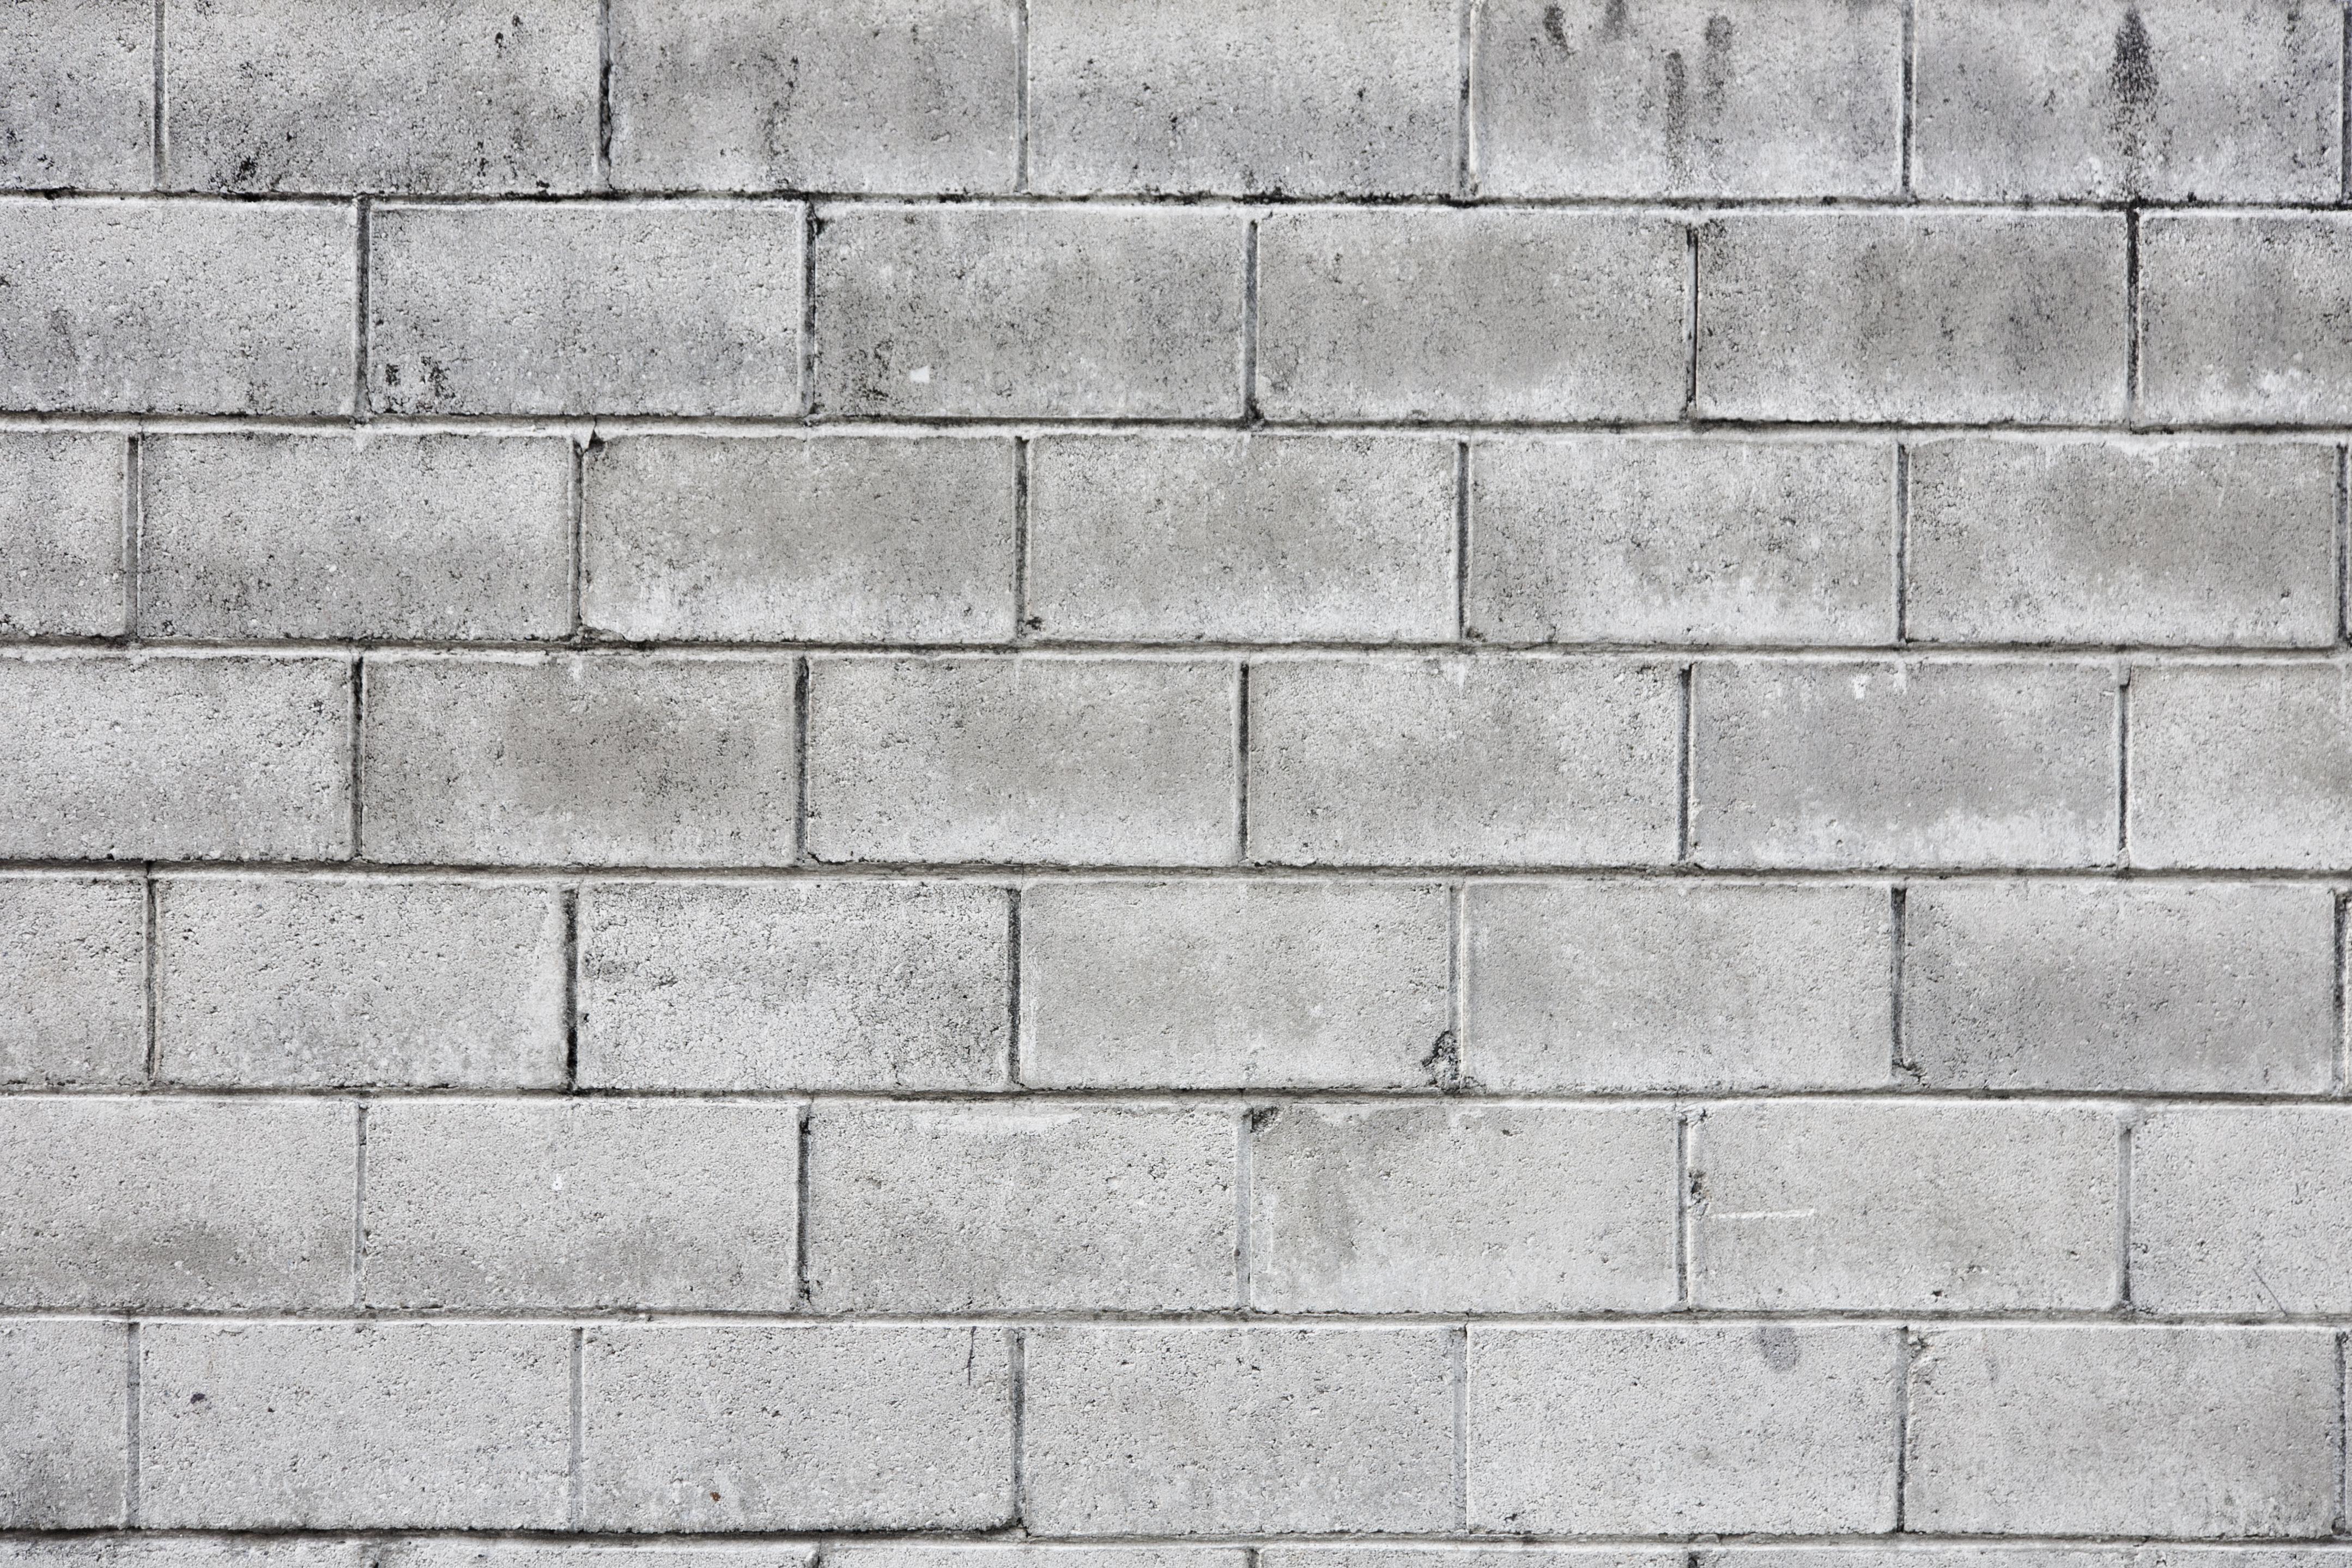 DIY Cinder Block Retaining Walls With Rebar and Concrete   Hunker